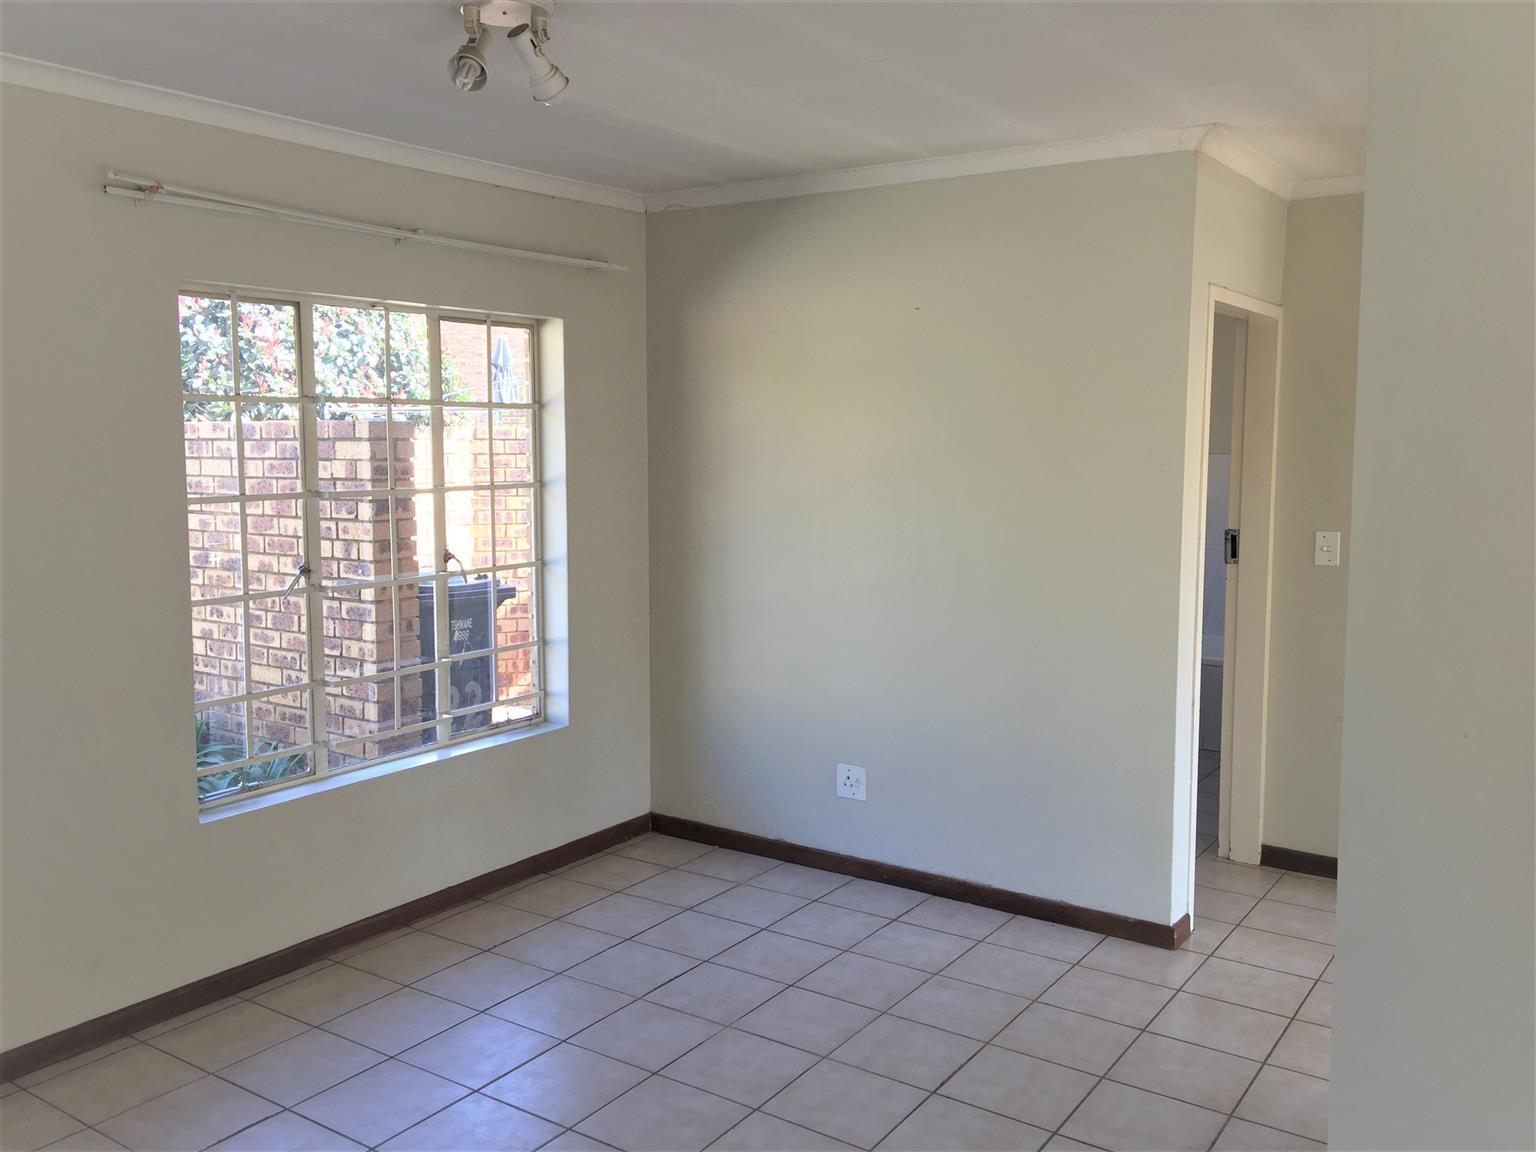 Townhouse to Let - Newlands - Pretoria East  - 3 Bedrooms